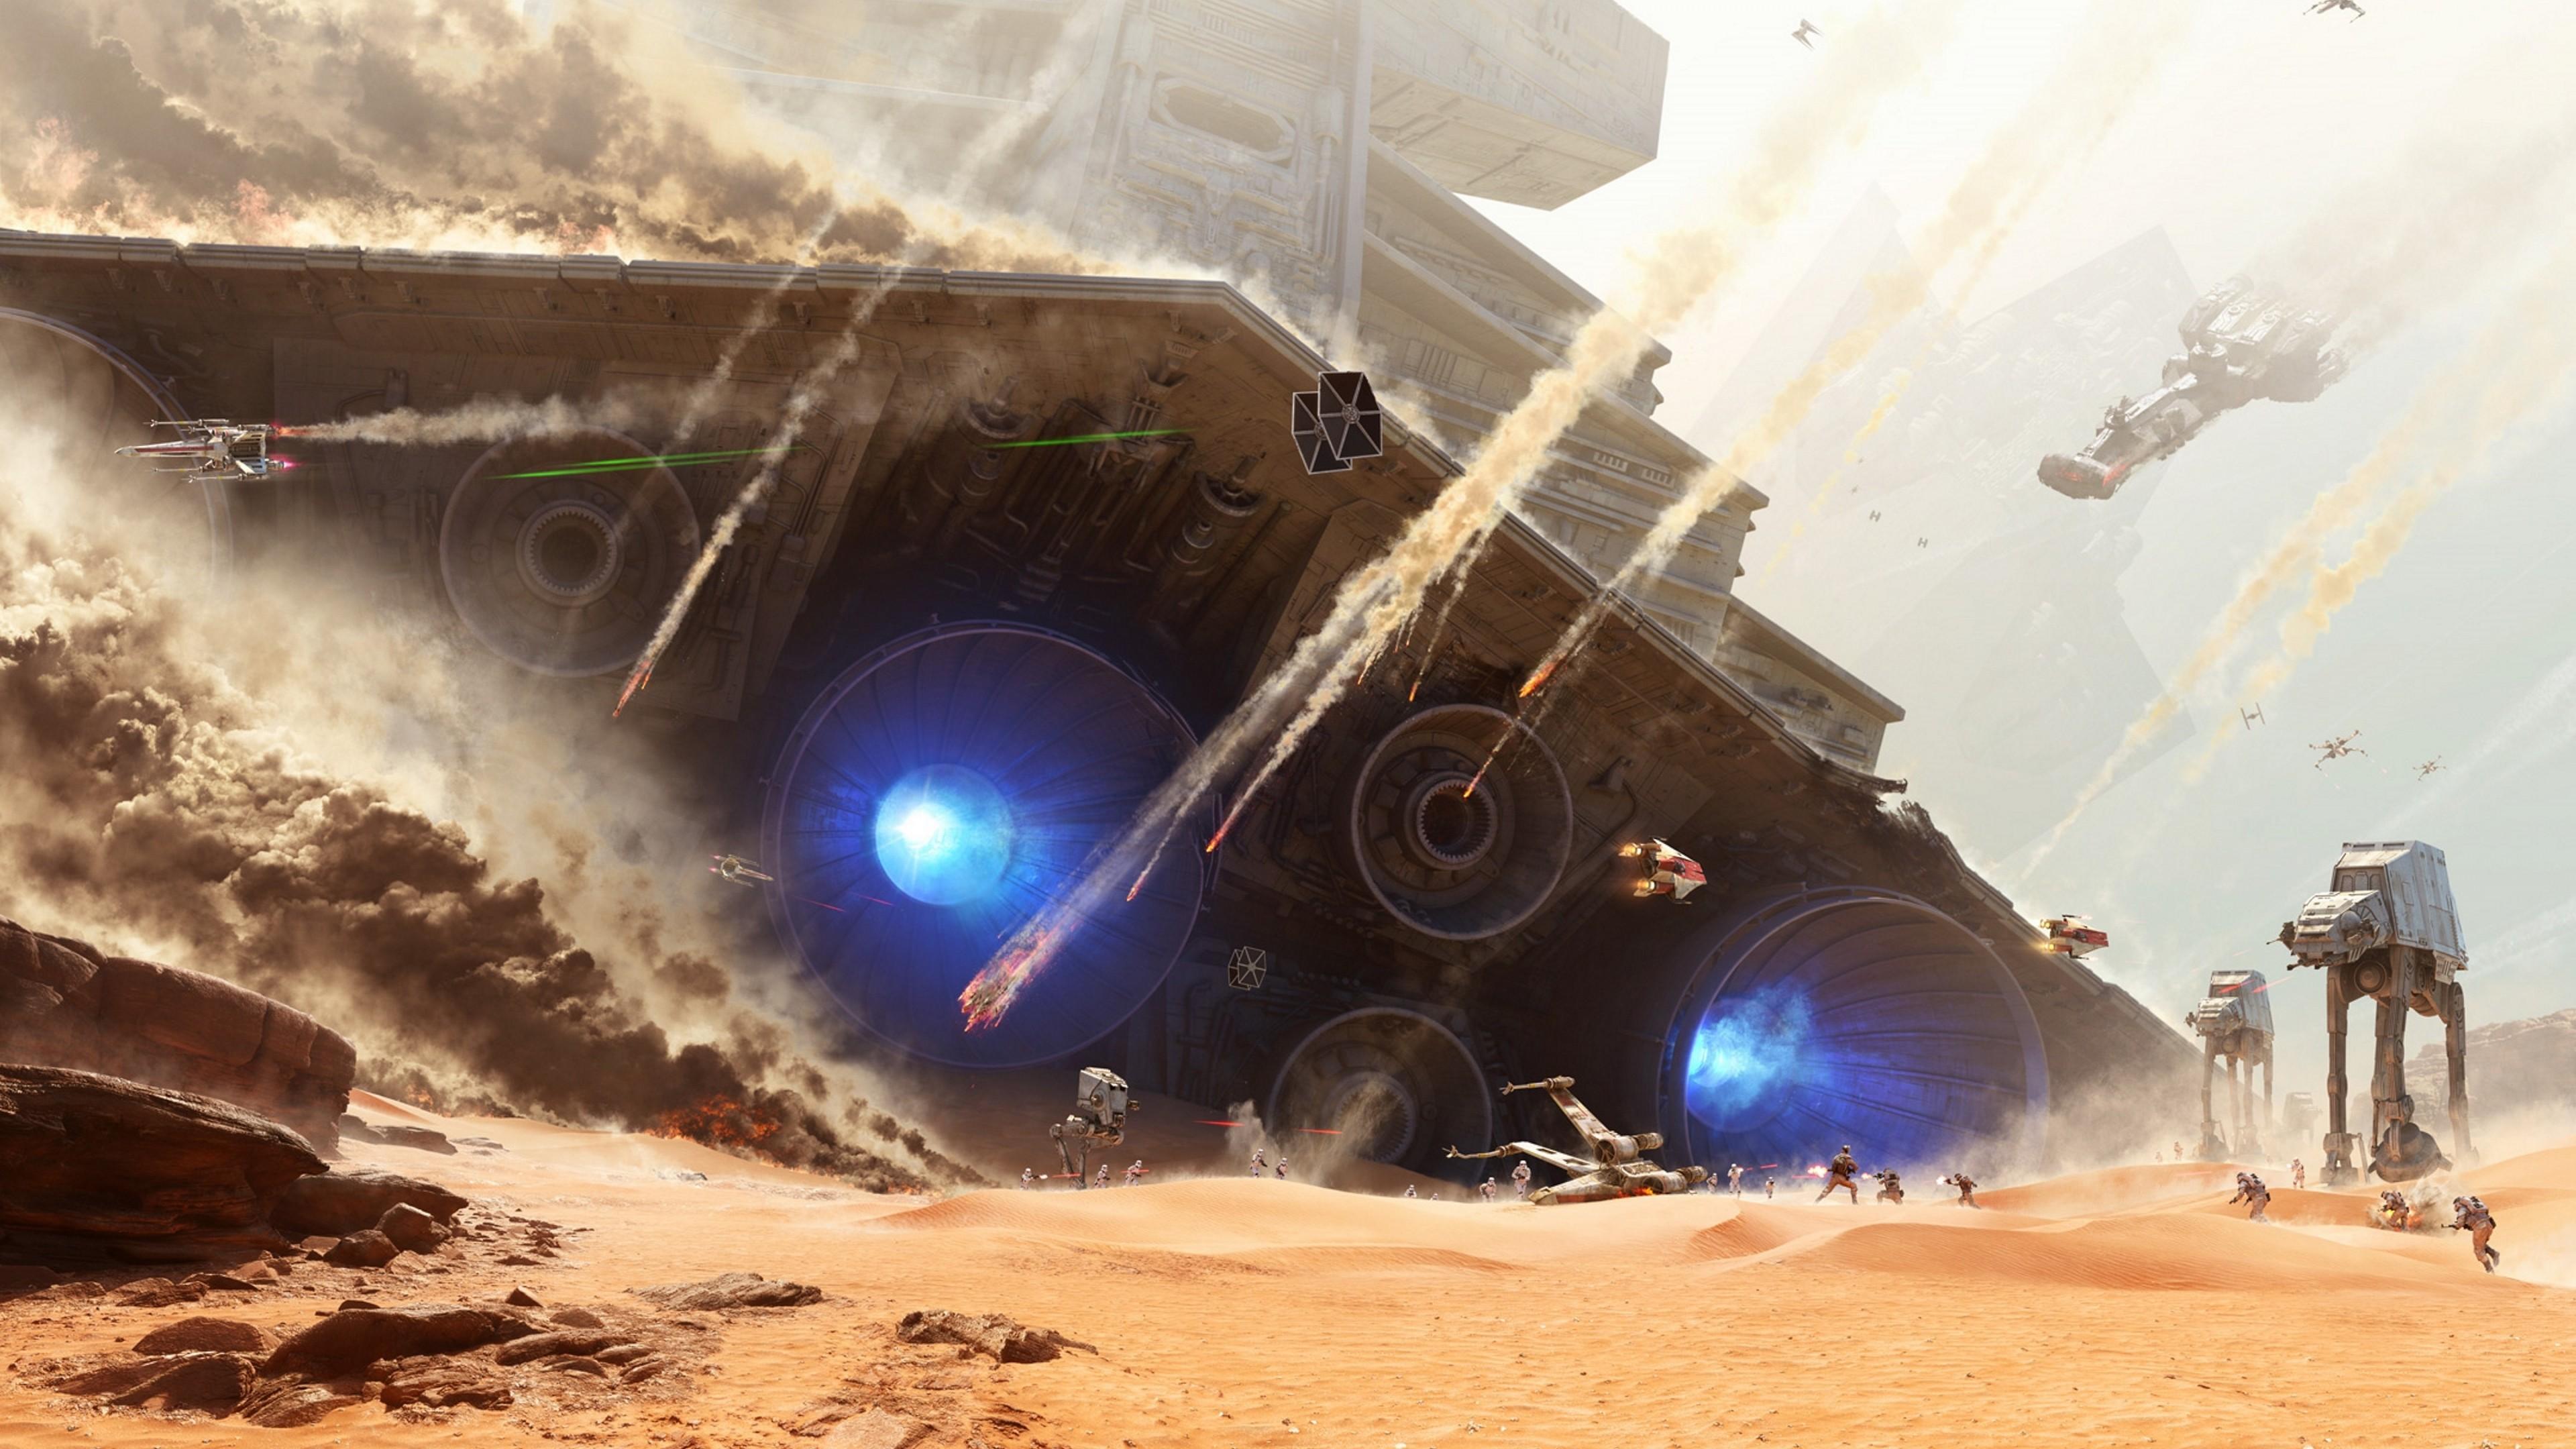 Wallpaper Star Wars Video Games Space Vehicle Battle